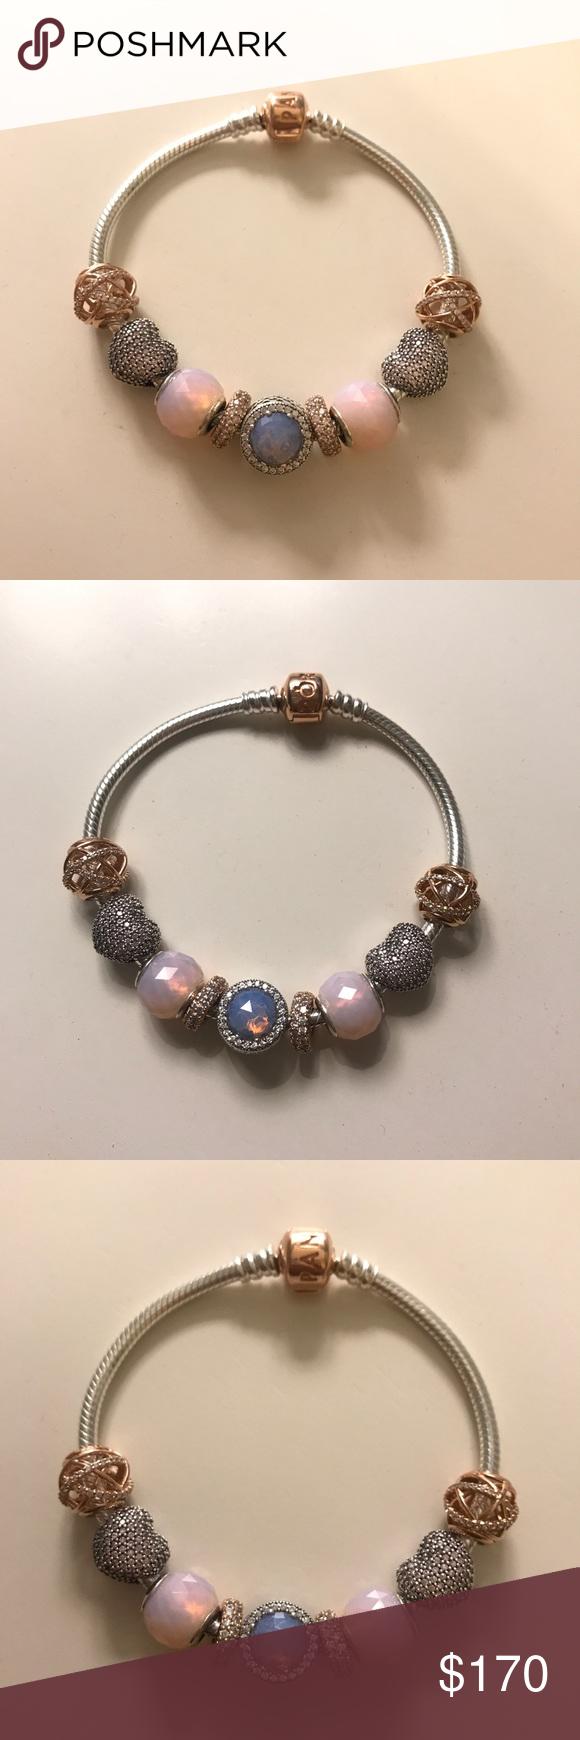 Pandora bracelet size with charms and clips pandora rose